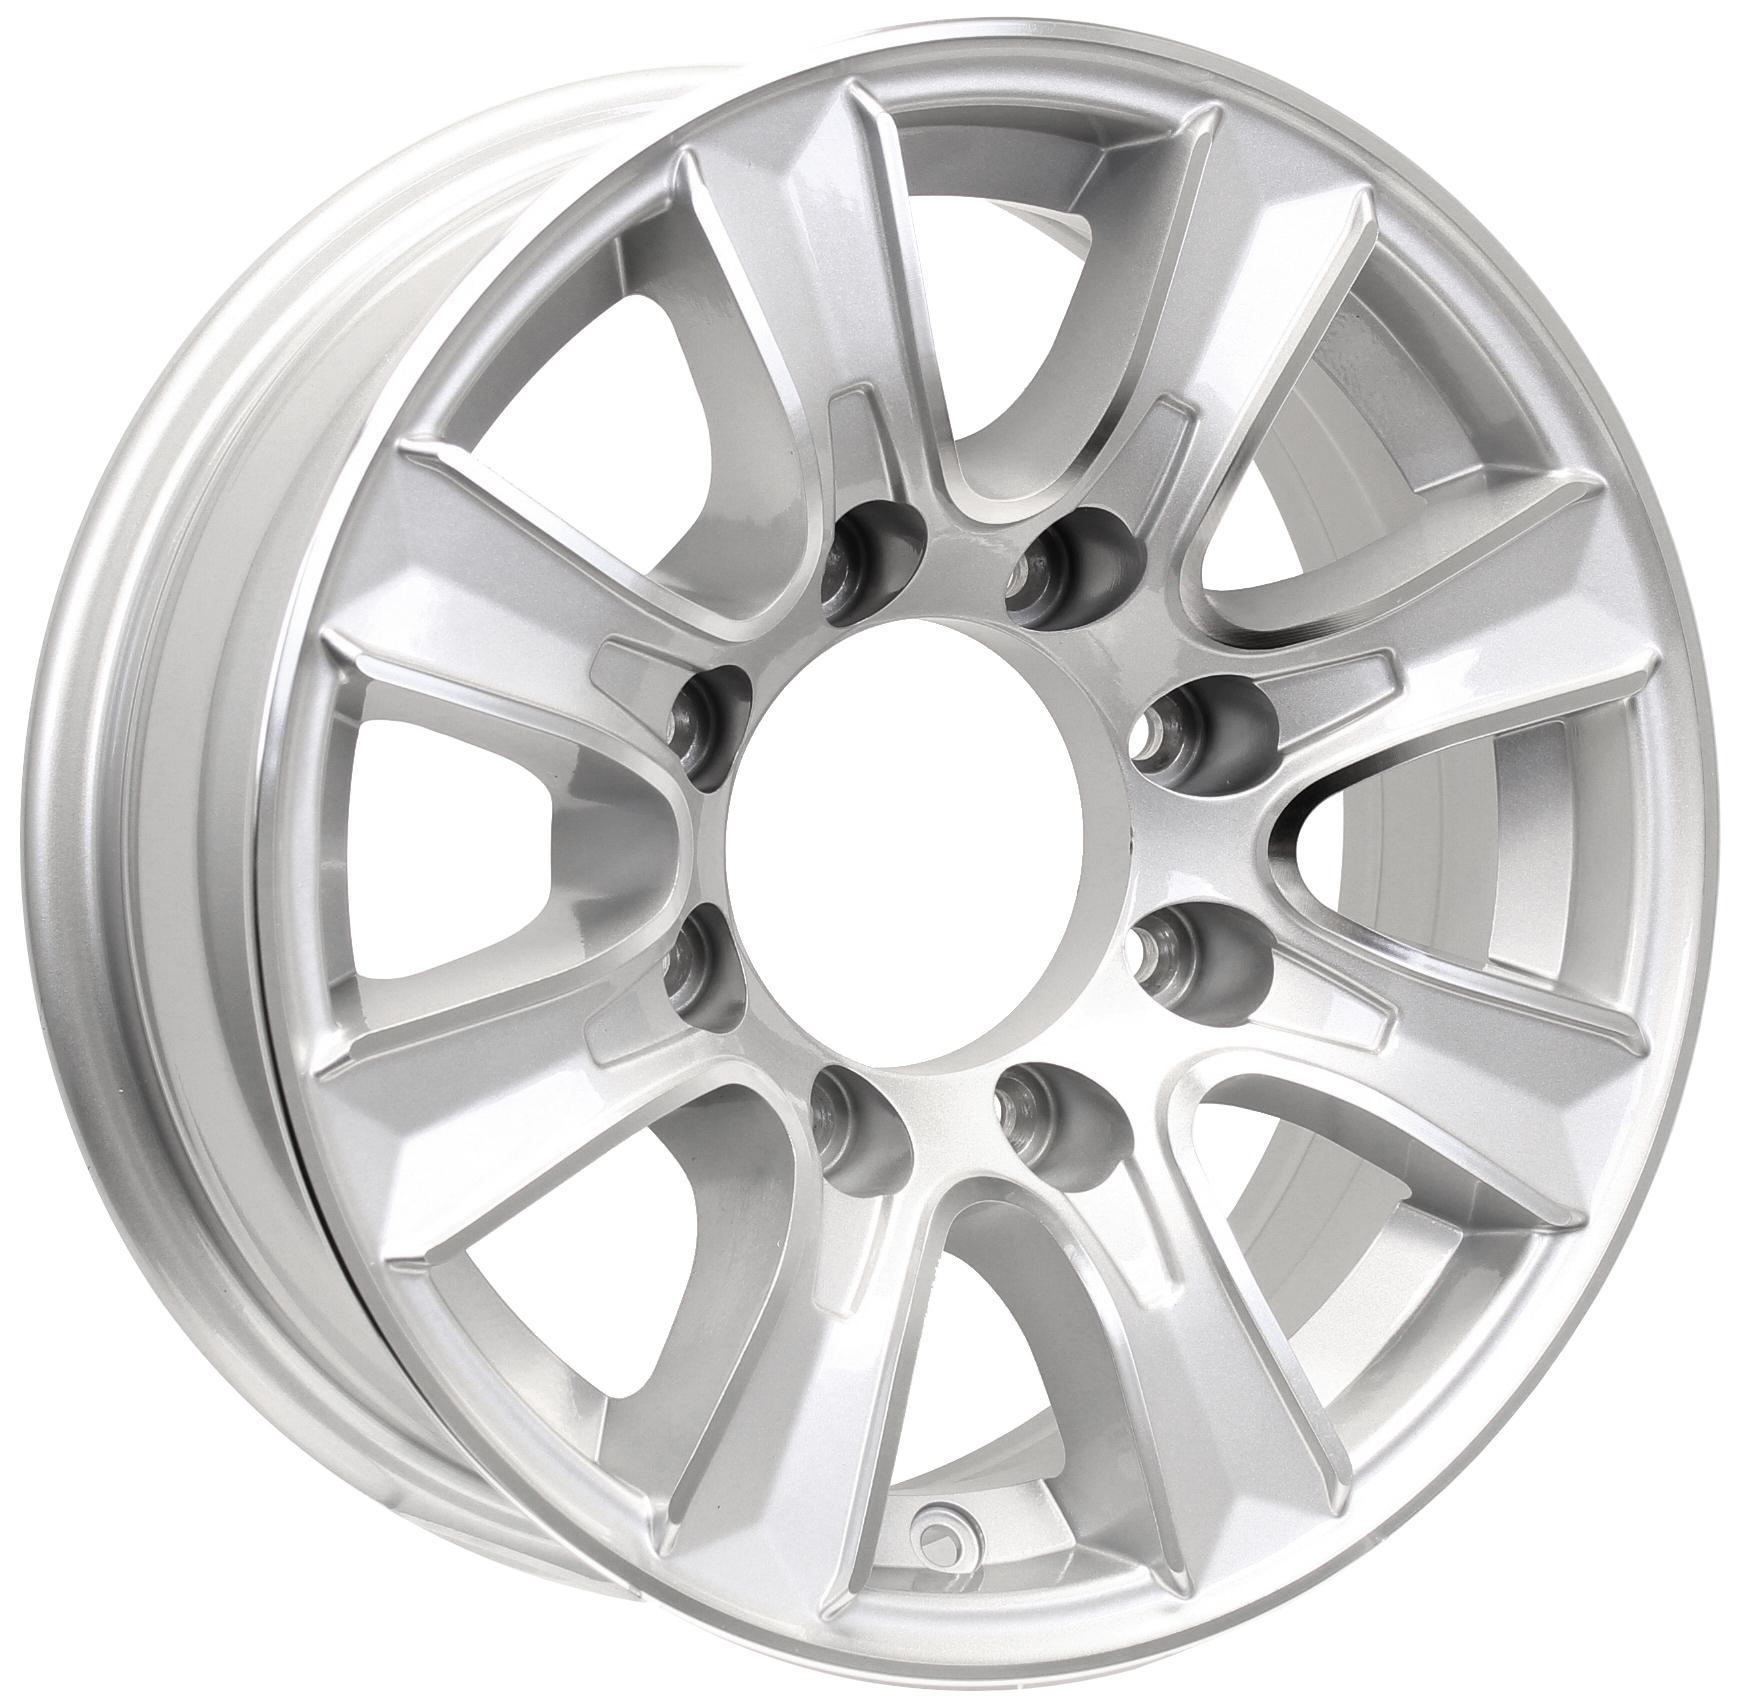 Thoroughbred 16x6; 8-Lug Silver Aluminum Trailer Wheel Image